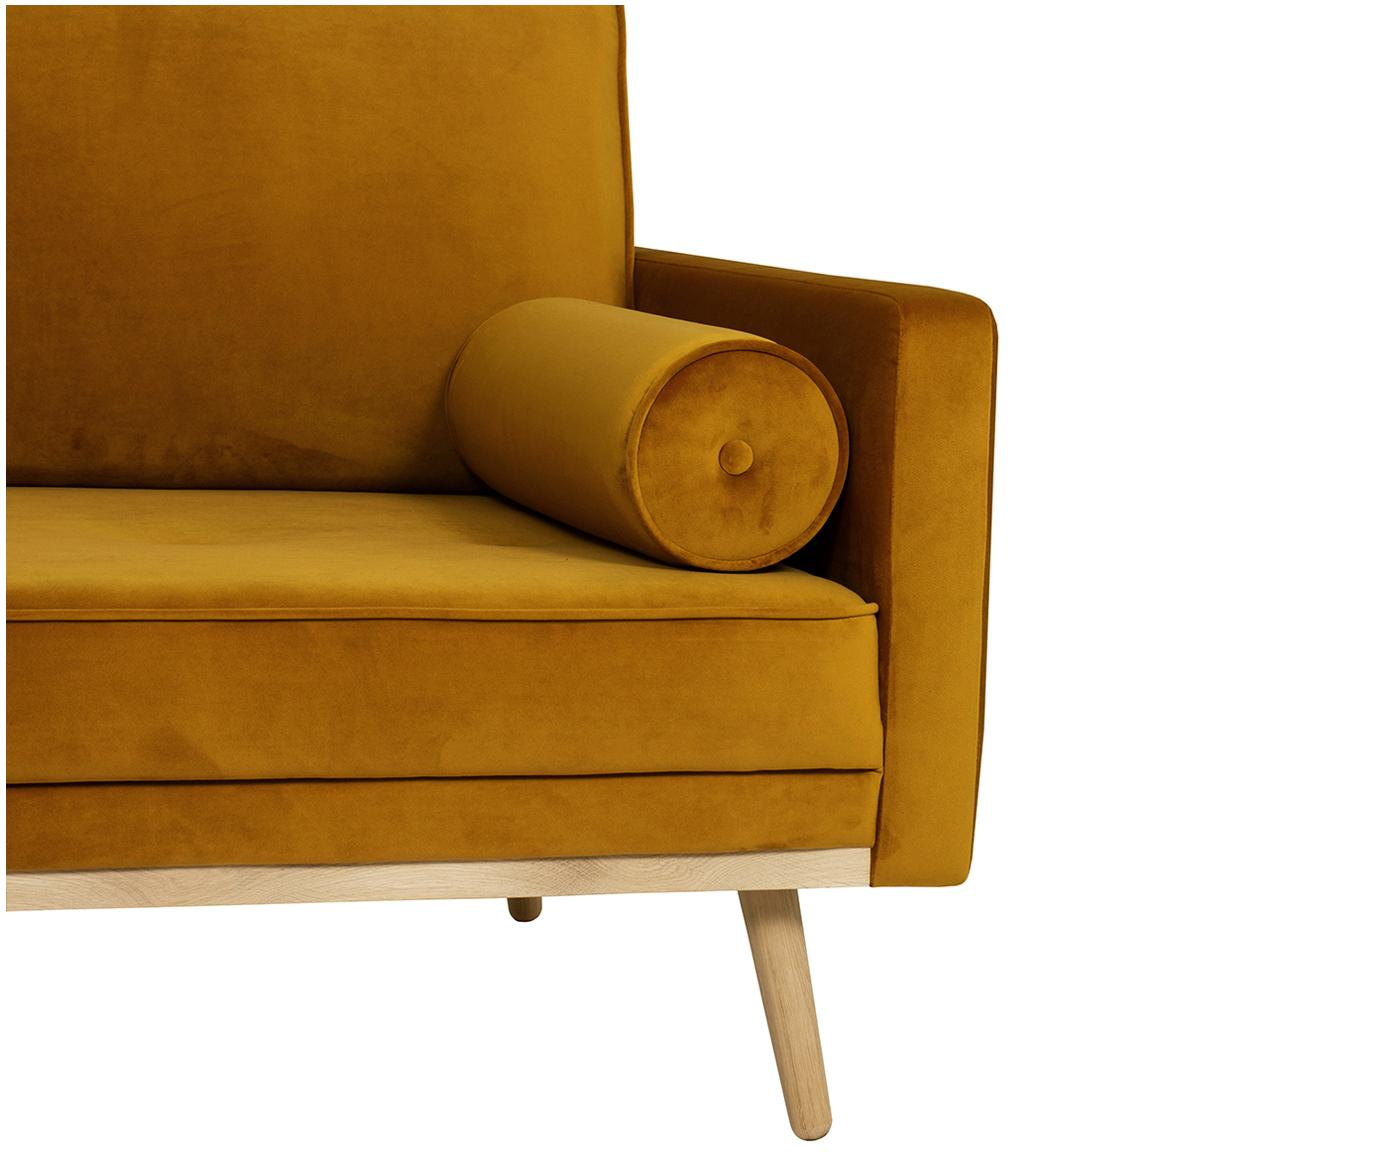 Fluwelen hoekbank Saint (3-zits), Bekleding: fluweel (polyester), Frame: massief eikenhout, spaanp, Okergeel, B 243 x D 220 cm